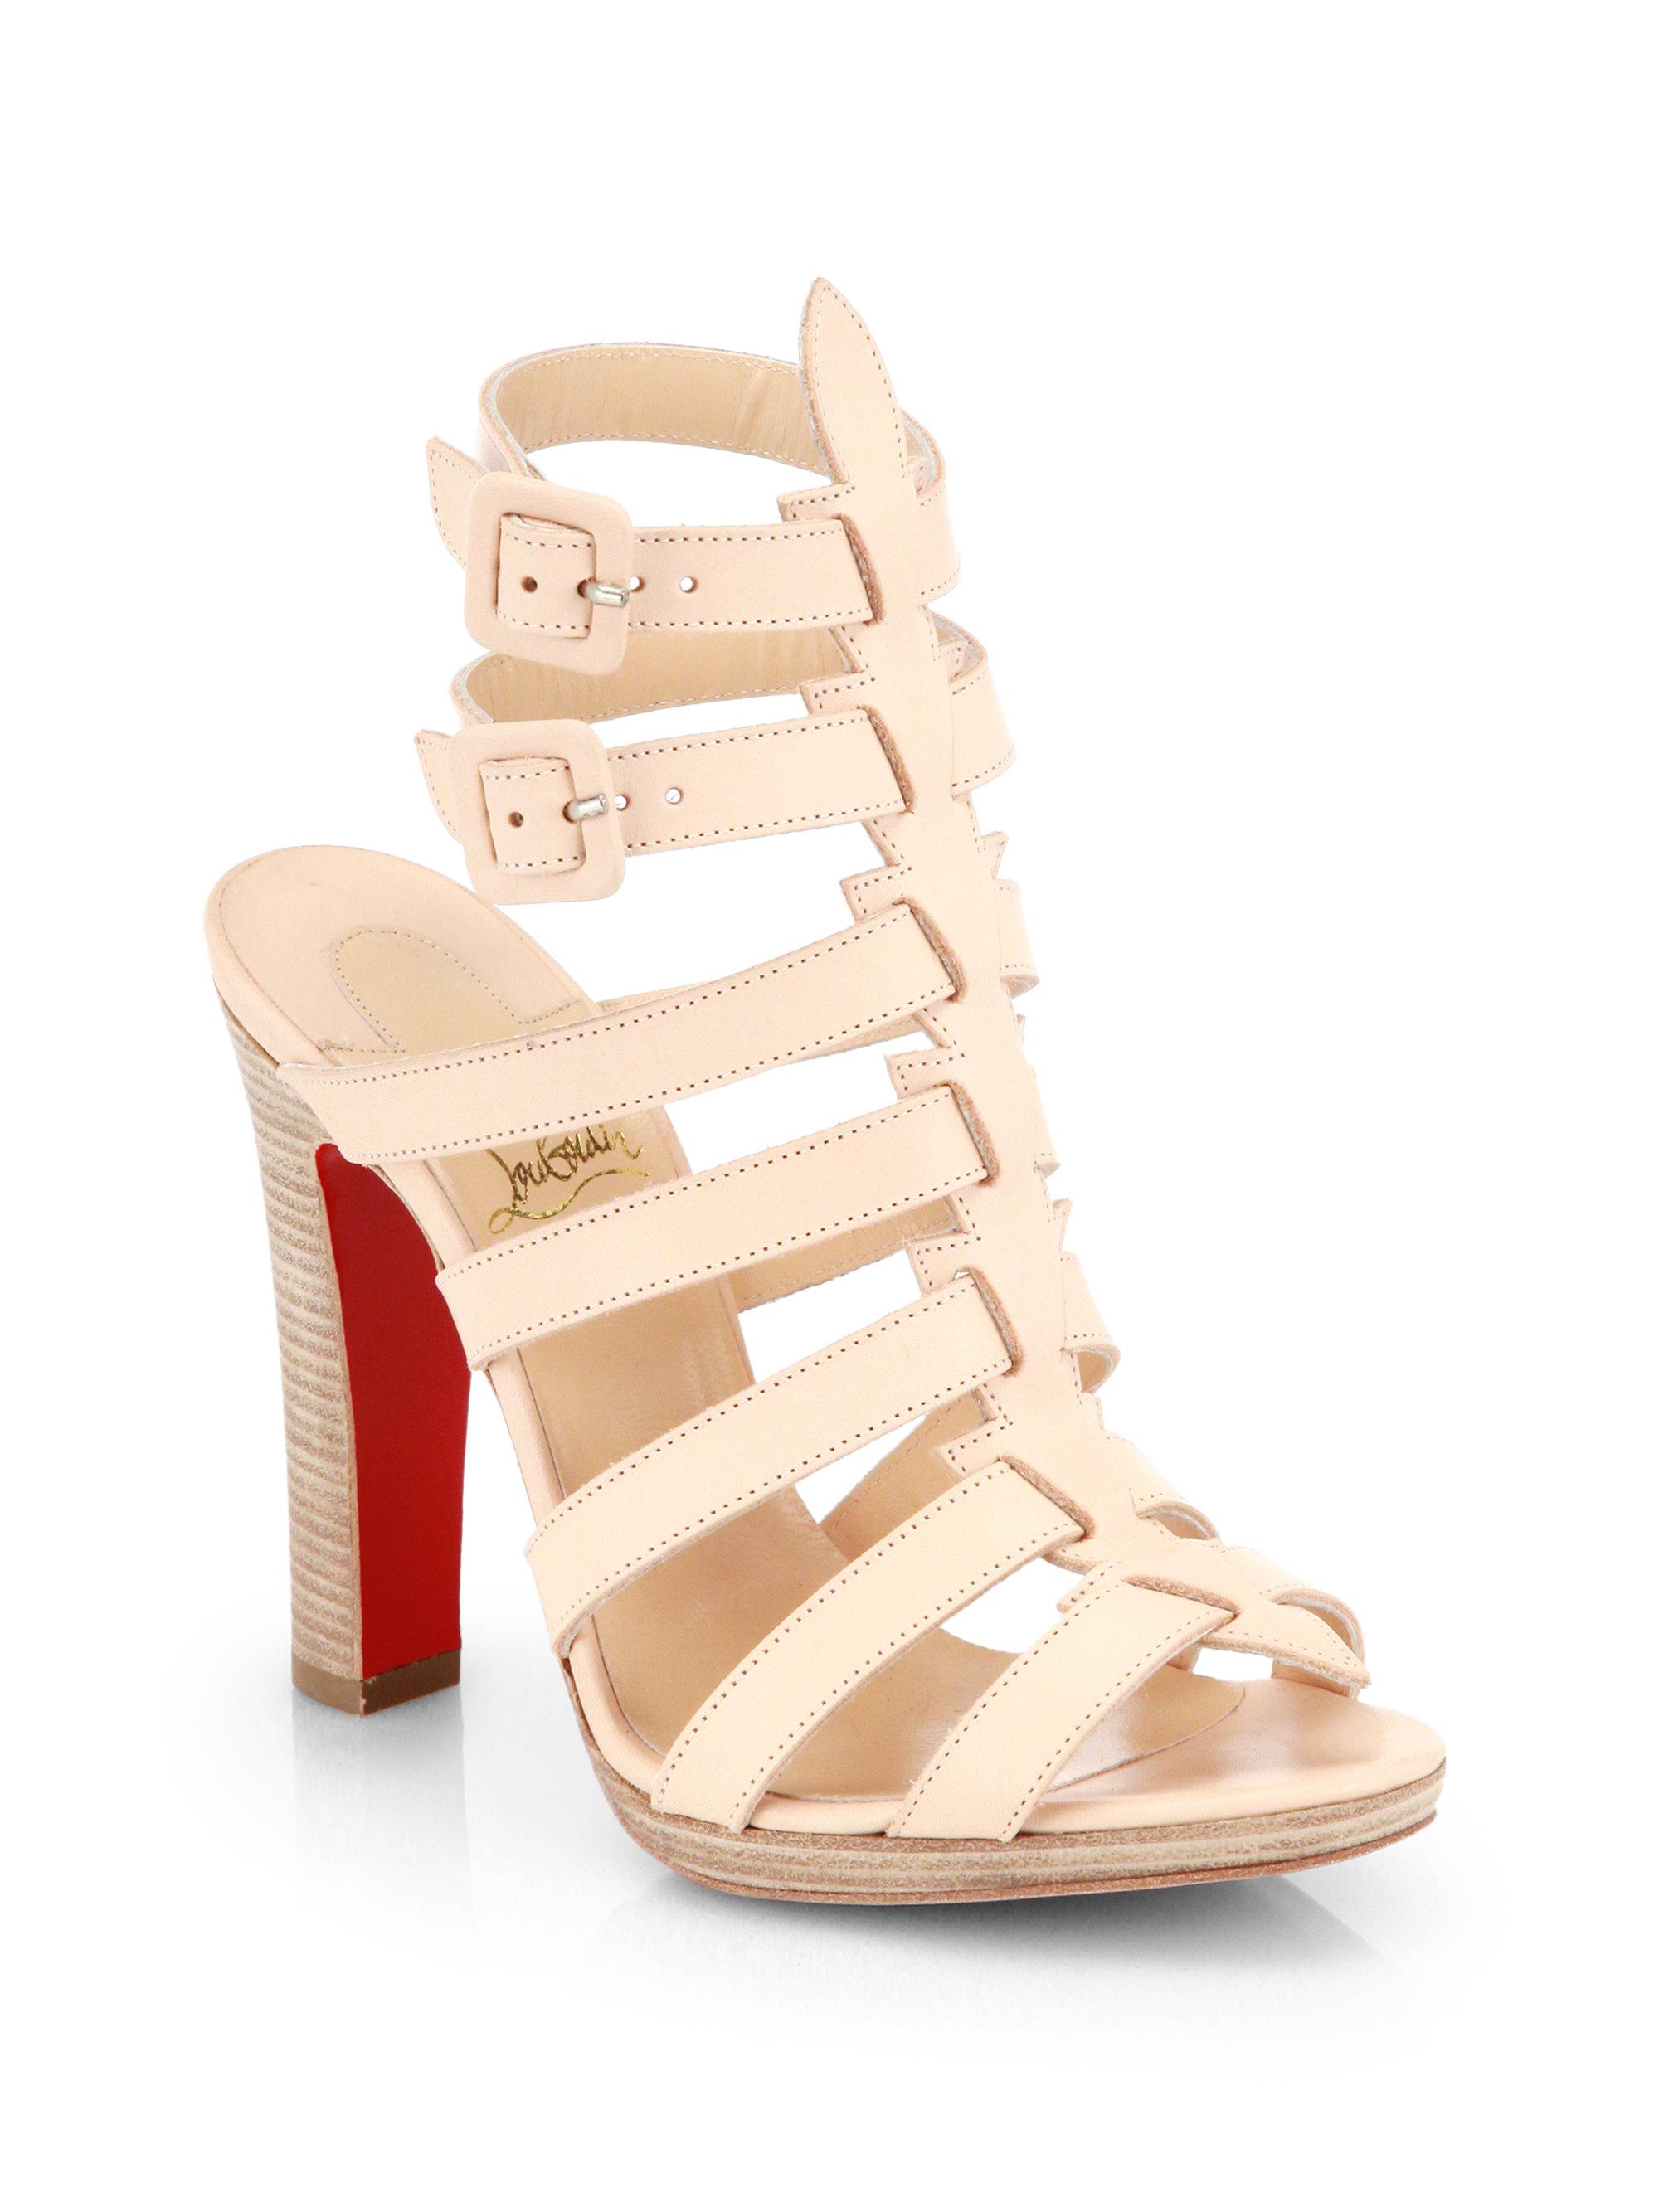 gold christian louboutin shoes - christian louboutin women's pyrabubble platform sandals, christian ...